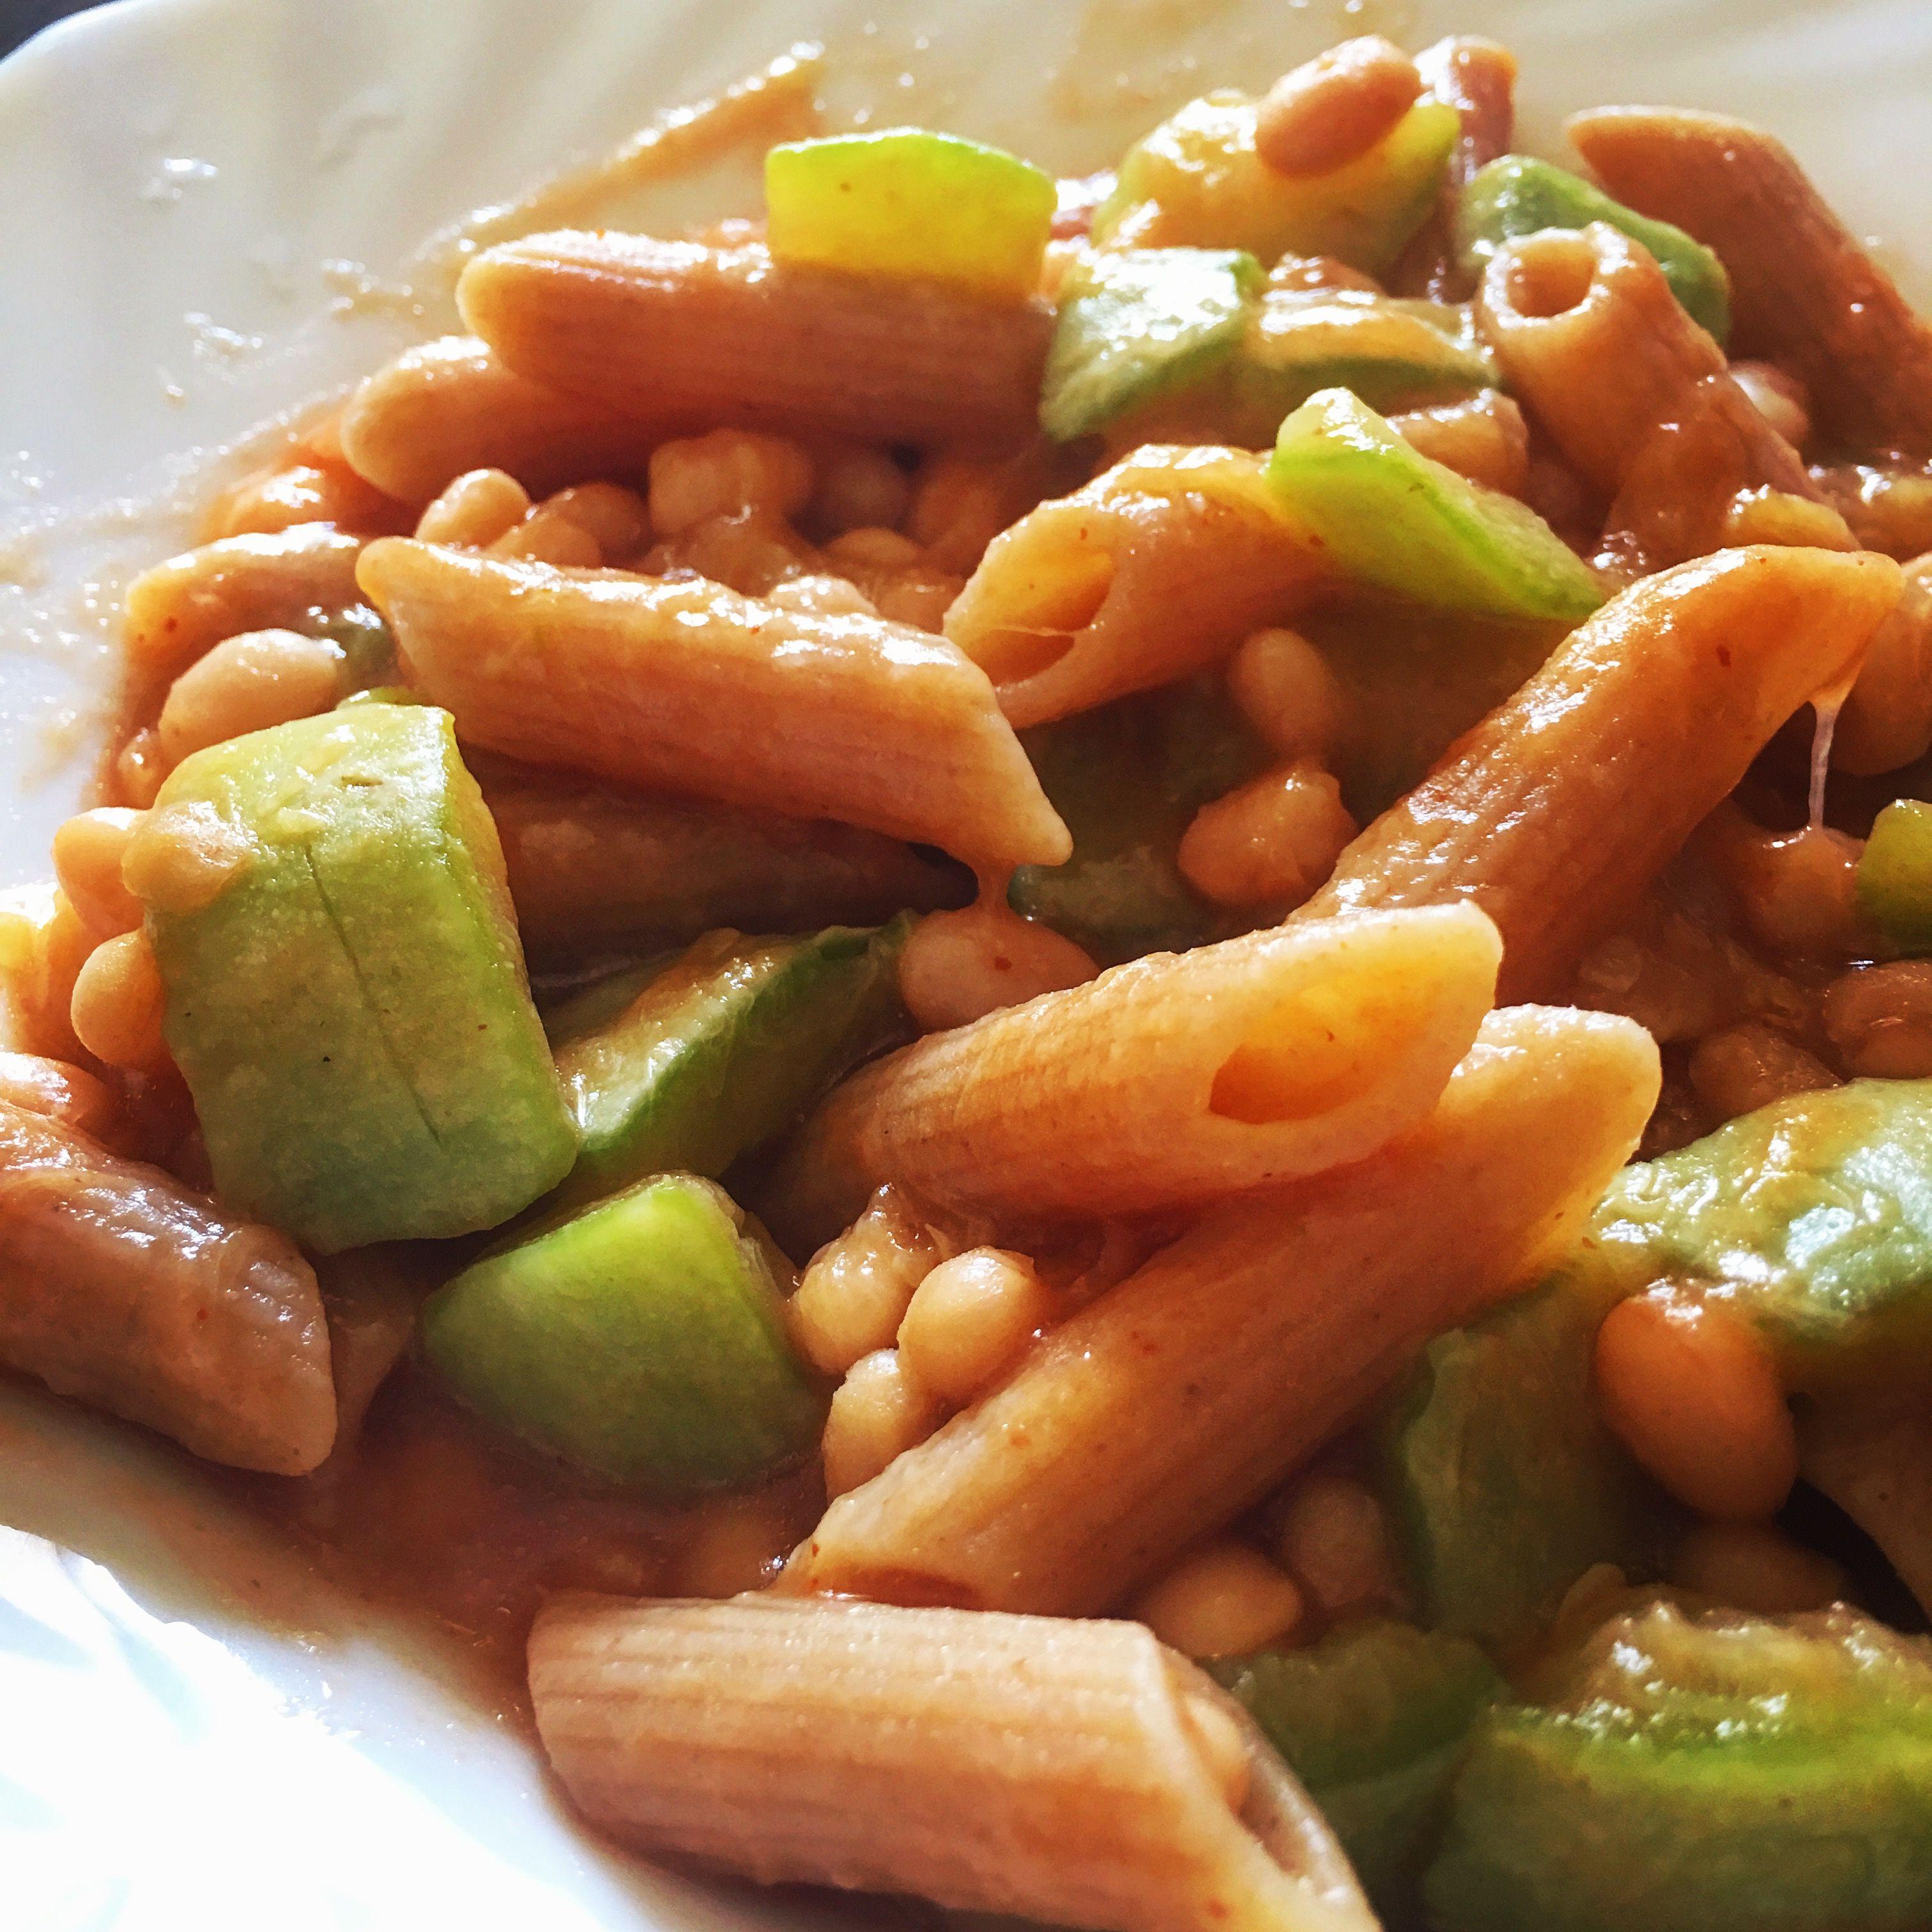 #Pennette con #zucchine, #fagioli e #pomodoro 🙃  Seguici su www.ricettelastminute.com 😉  #food #foodporn #foodgasm #italia #sicilia #sicily #pictureoftheday #photooftheday #ricetta #ricette #me #instafood #yummy #foodie #siciliabedda #igers #igeritalia #igersicilia #foods #italianfood #picture #ricetteperpassione #instalike #instapic #instafollow